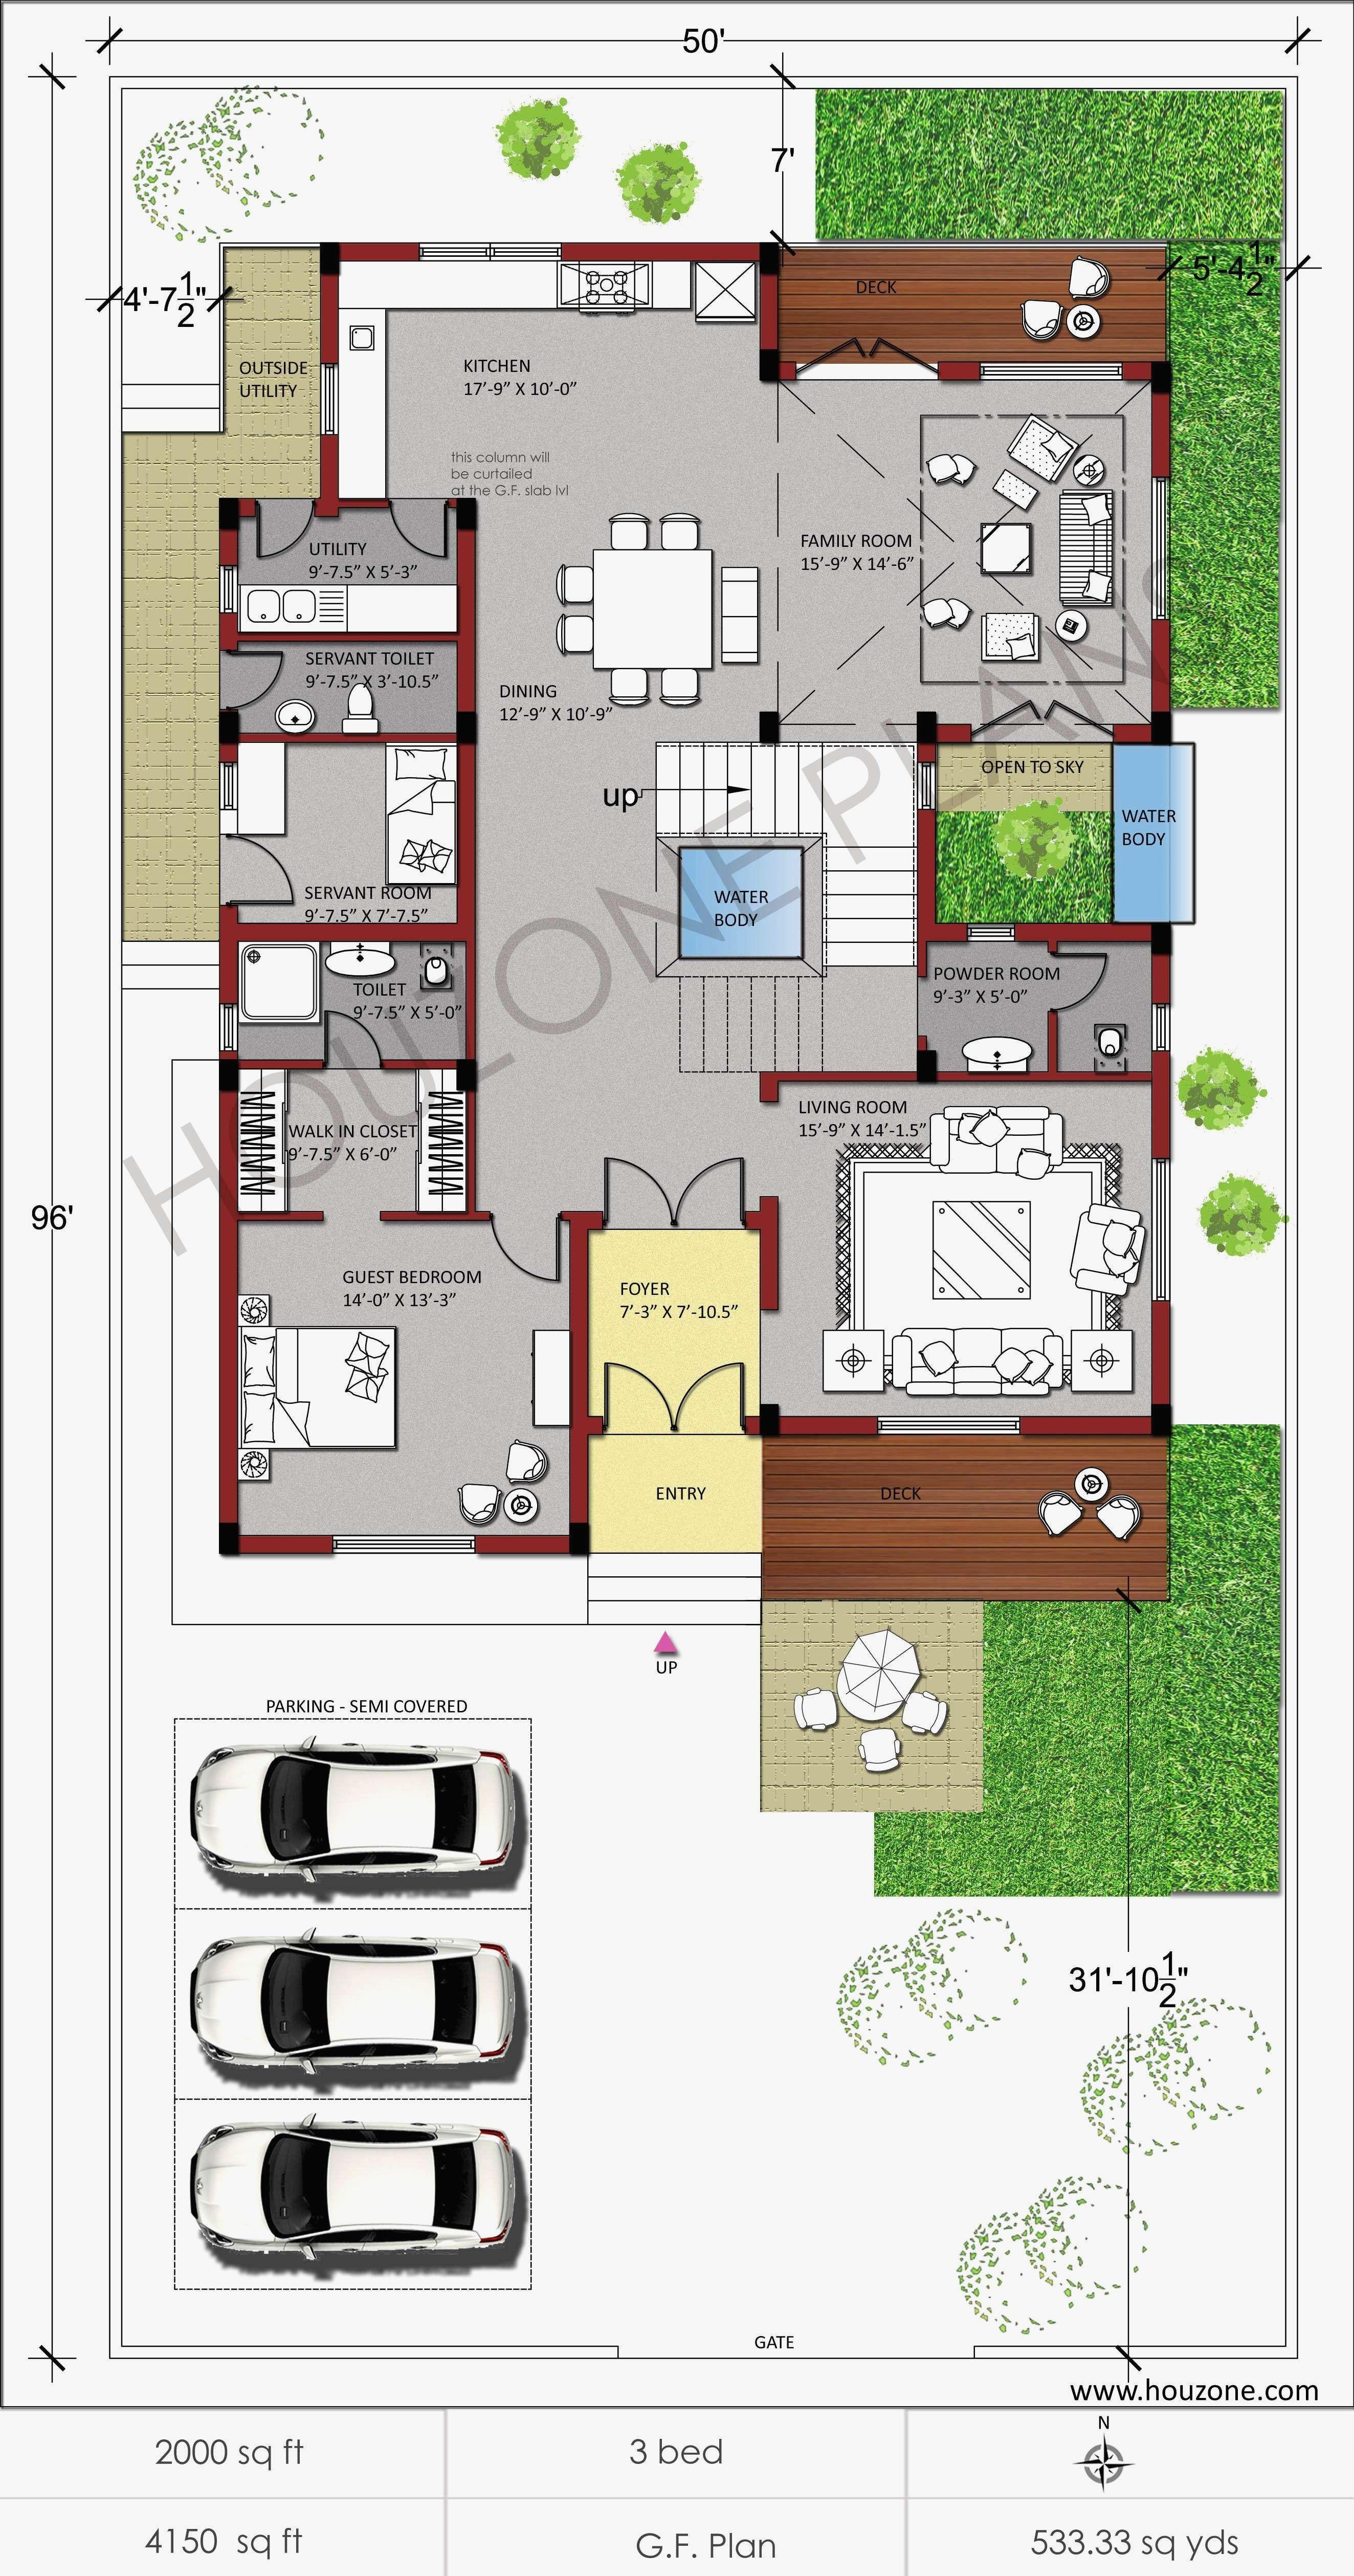 Duplex House Plans Indian Style Lovely Duplex House Plans Duplex House Plans Beautiful House Plans Vastu House